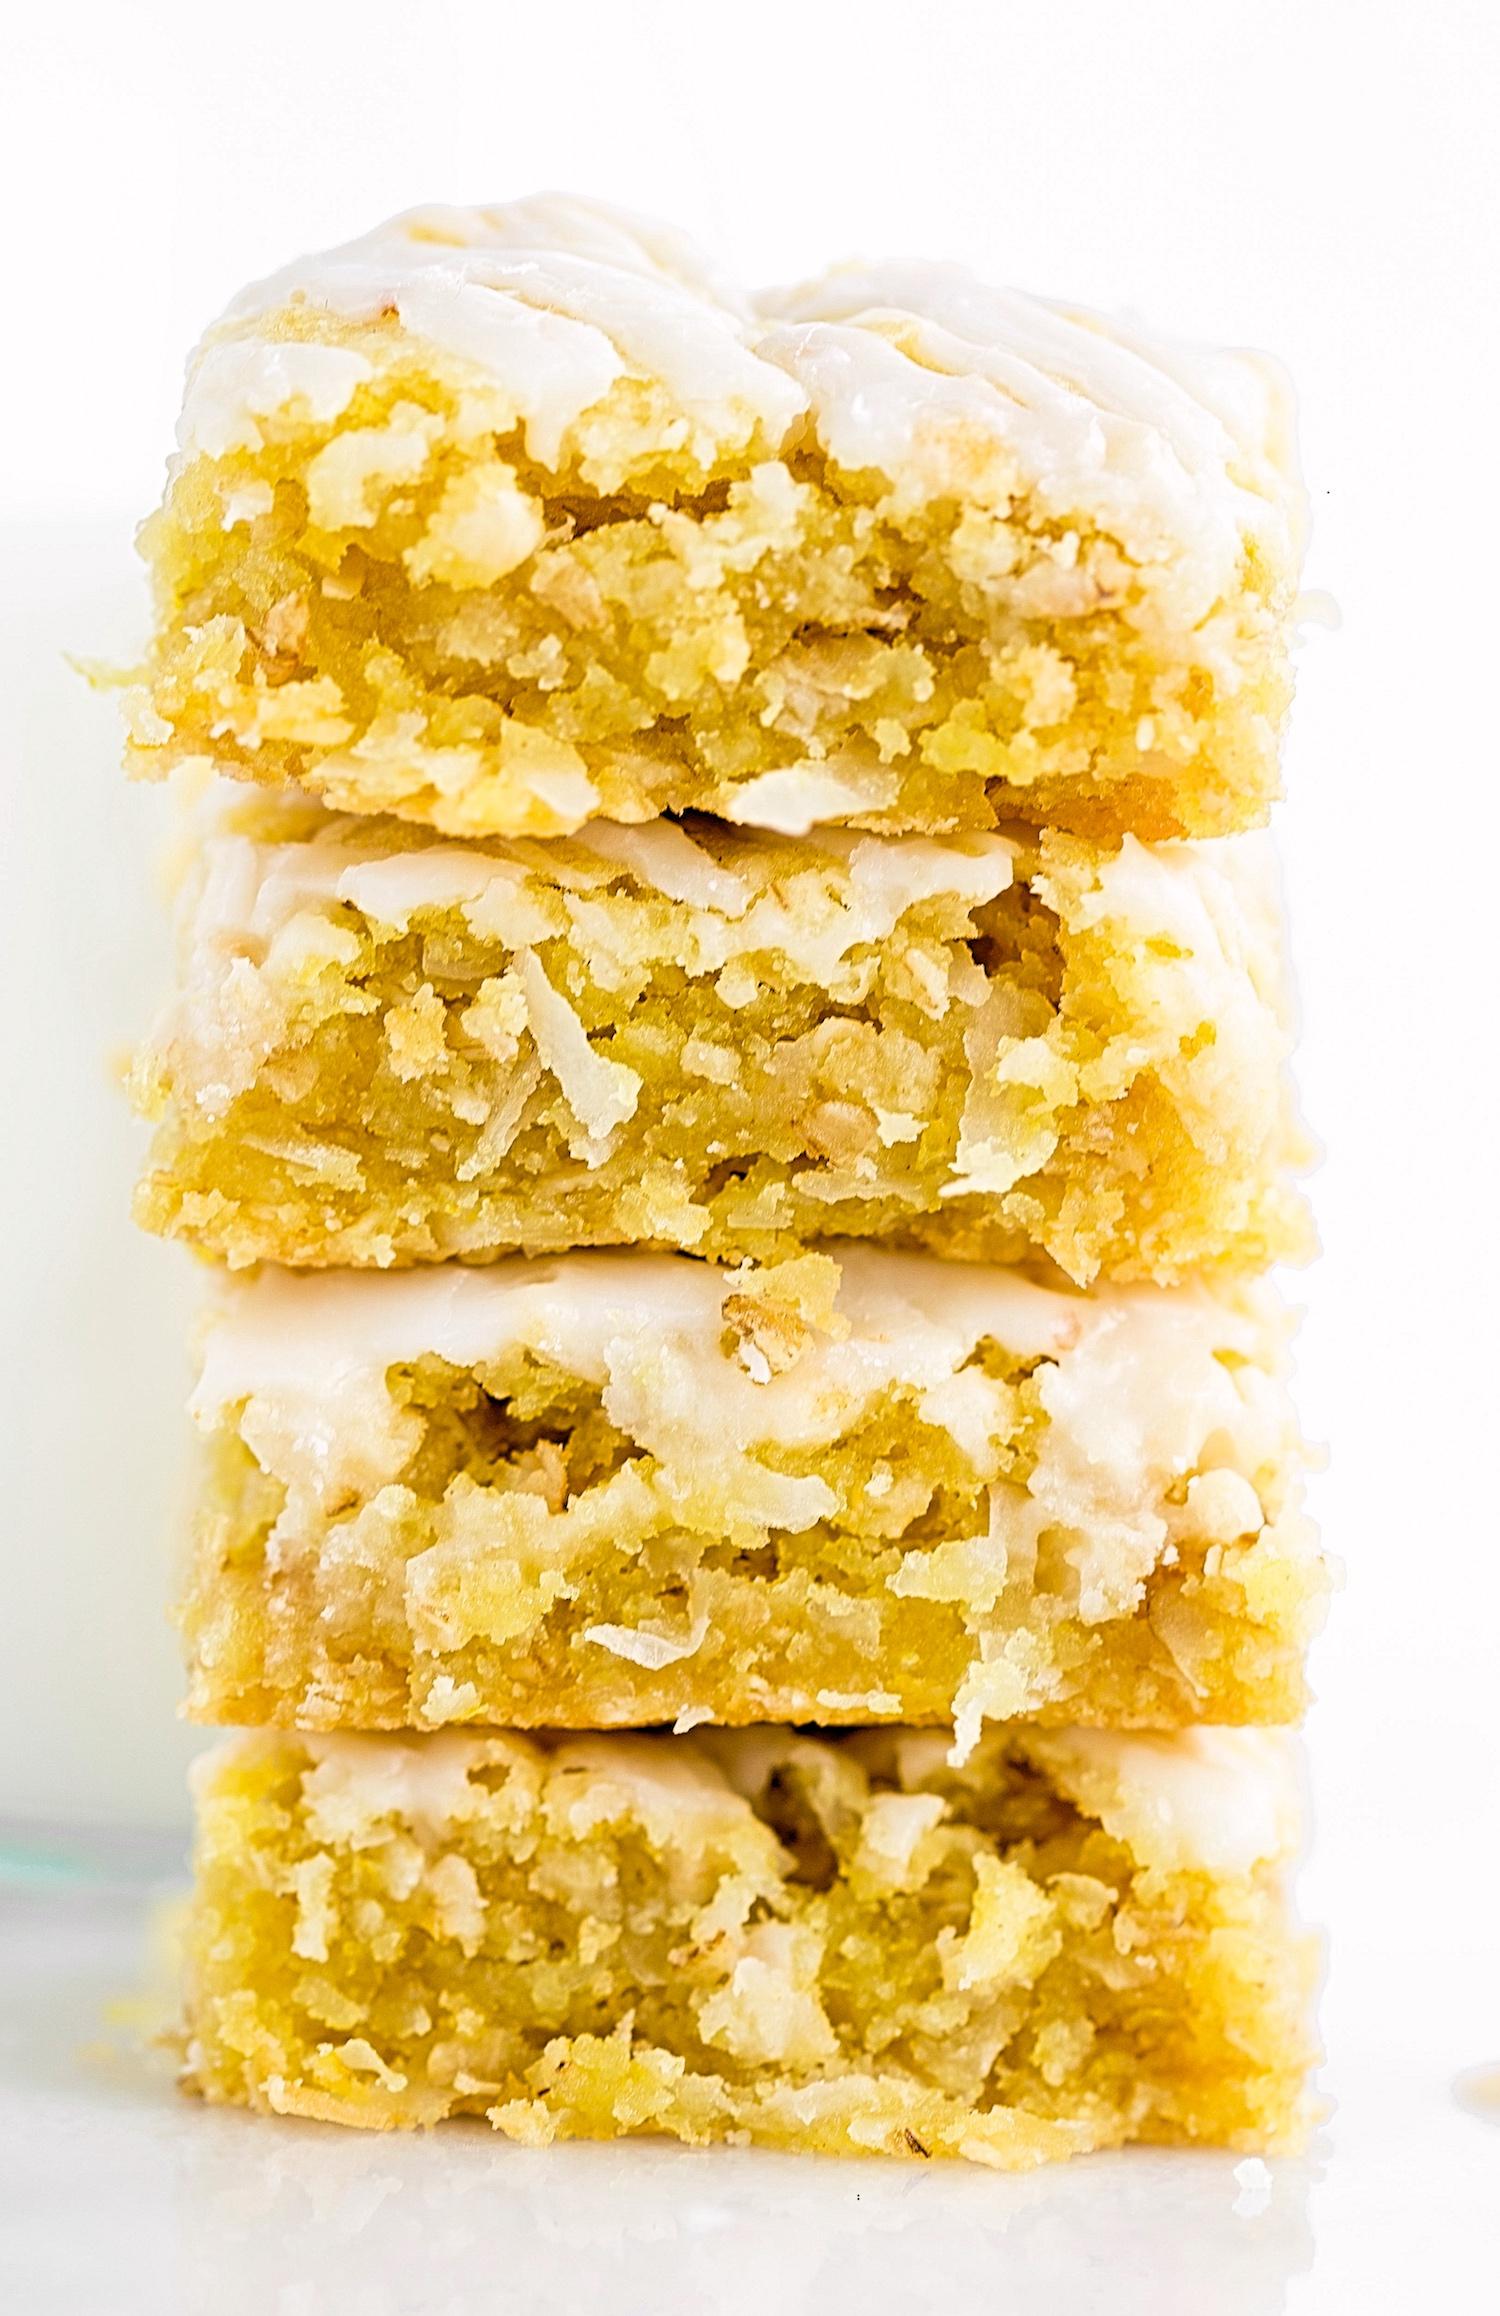 lemon oatmeal blondies 8.jpgLemon Coconut Oat Blondies: soft, gooey, rich lemon blondies filled with coconut flakes and oats. Quick and easy! | TrufflesandTrends.com